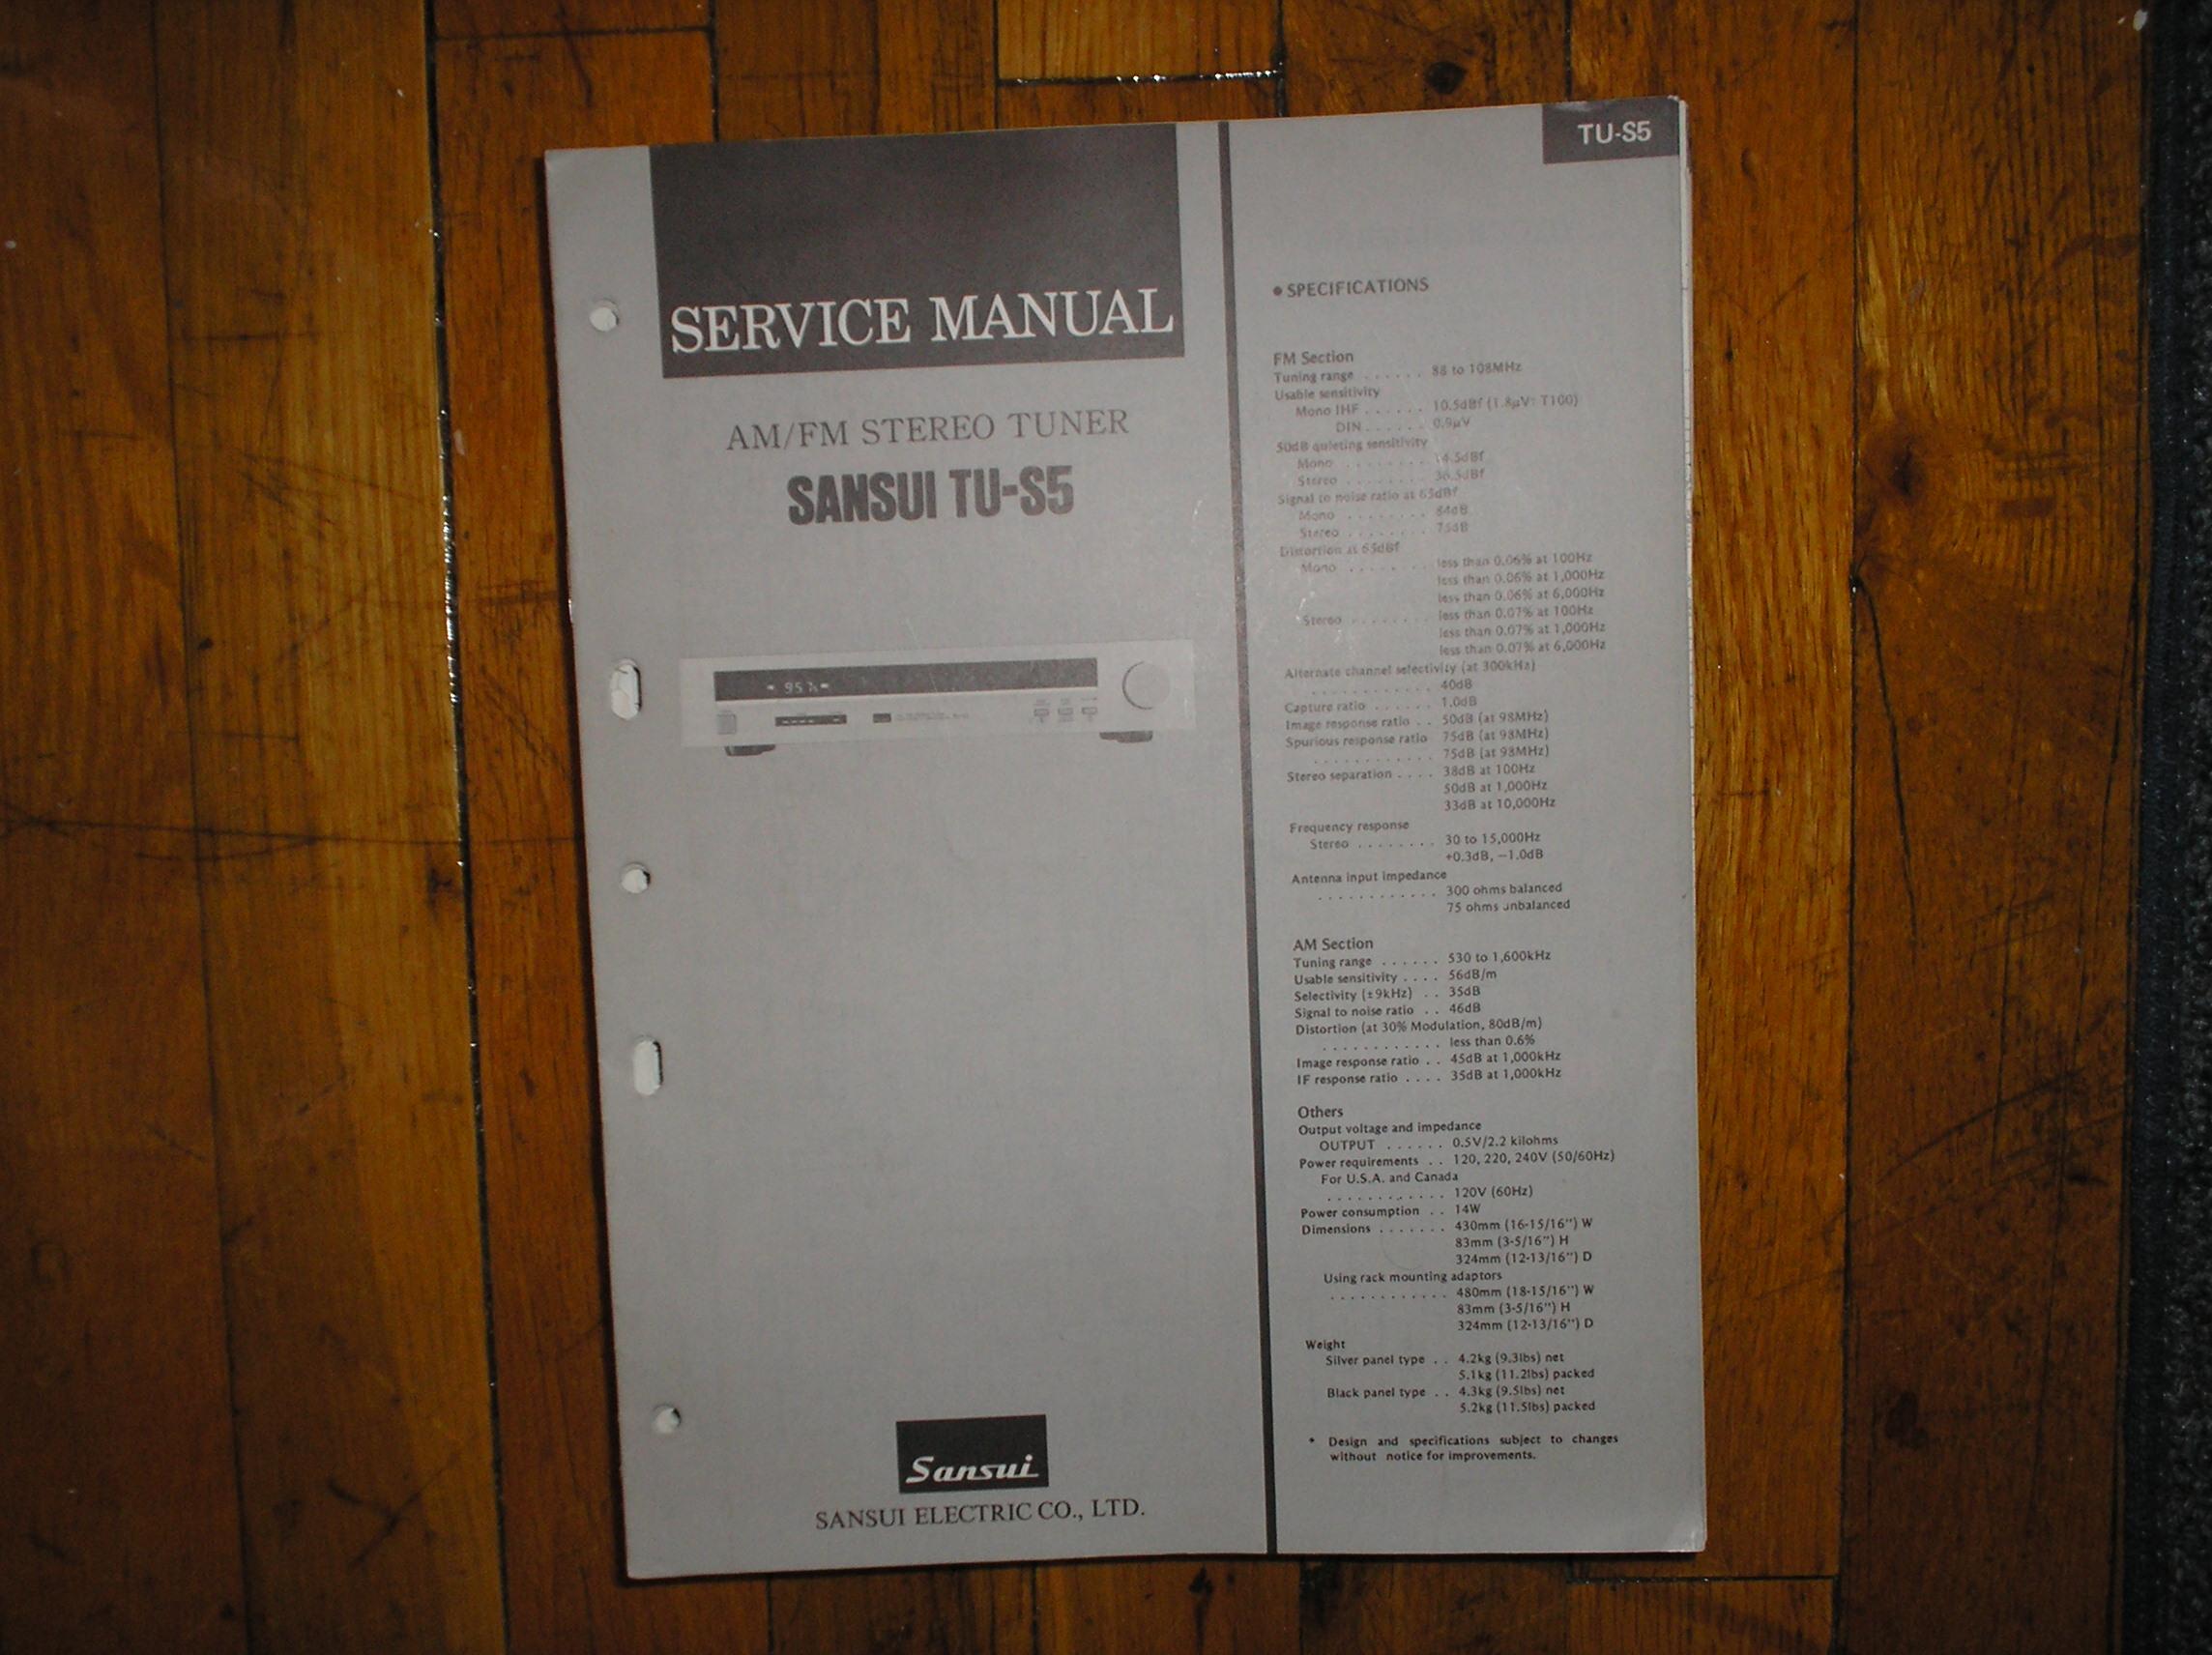 TU-S5 Tuner Service Manual